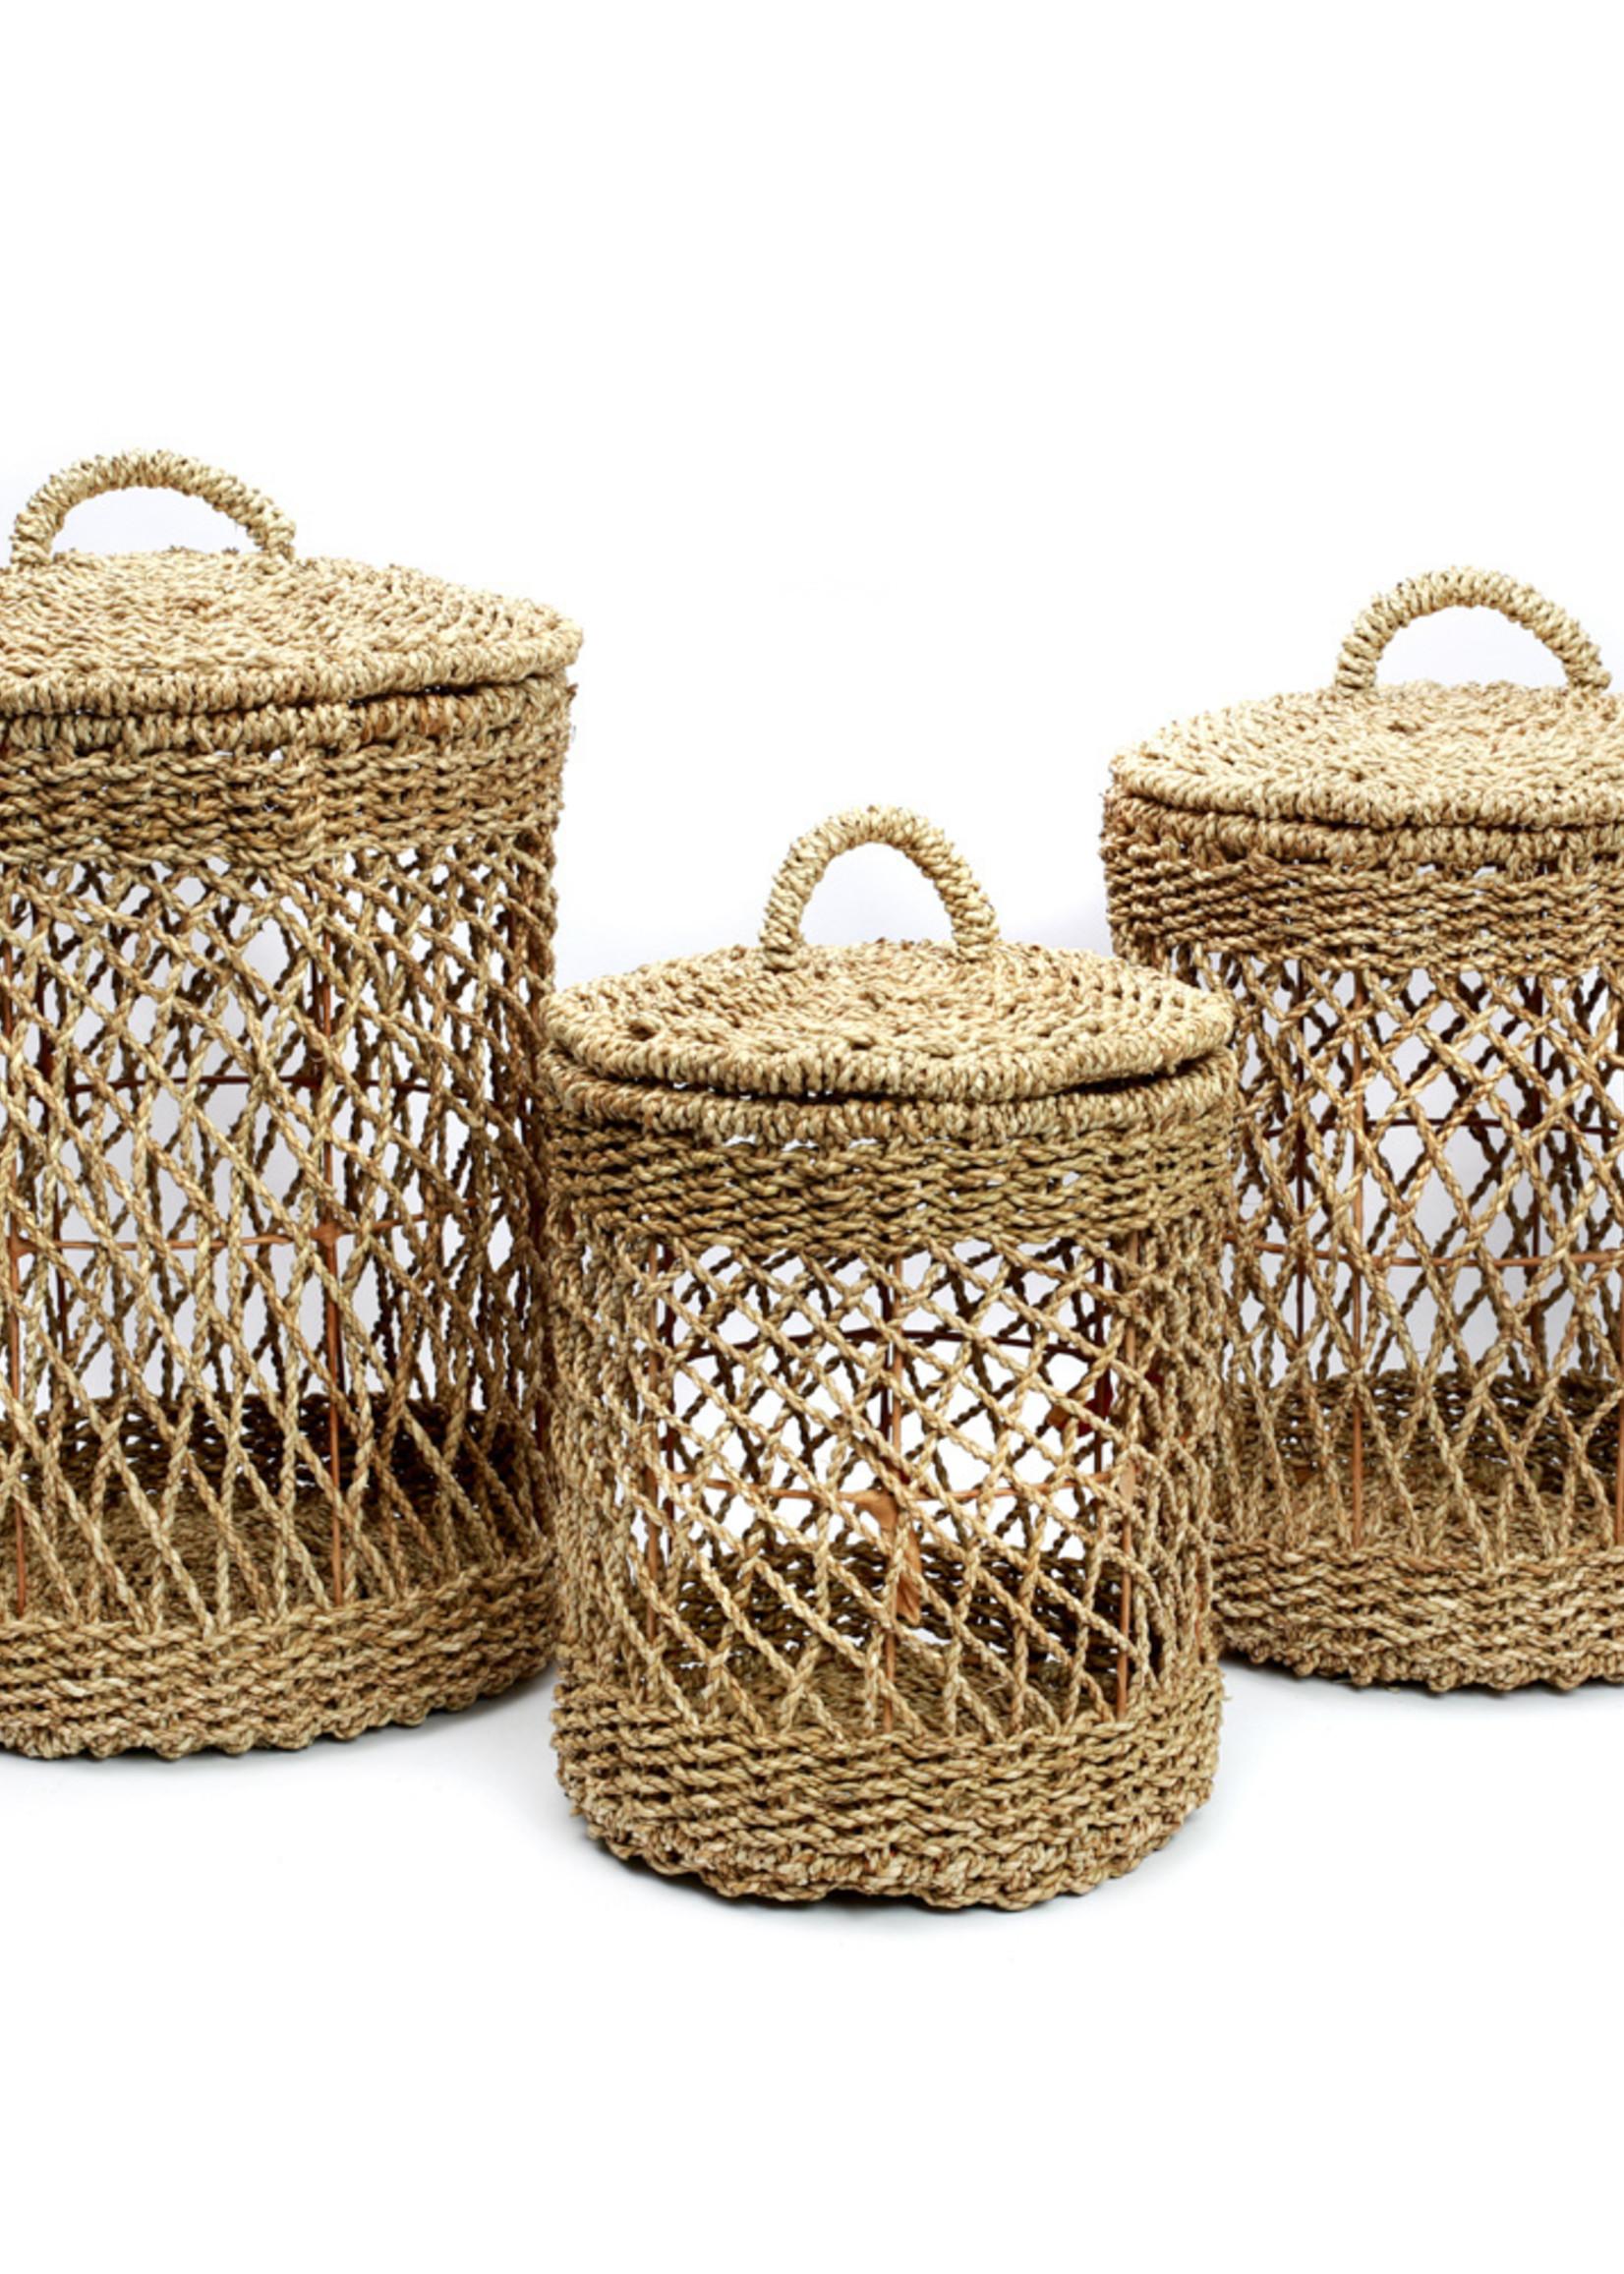 The Laundry Basket - Natural - SET3